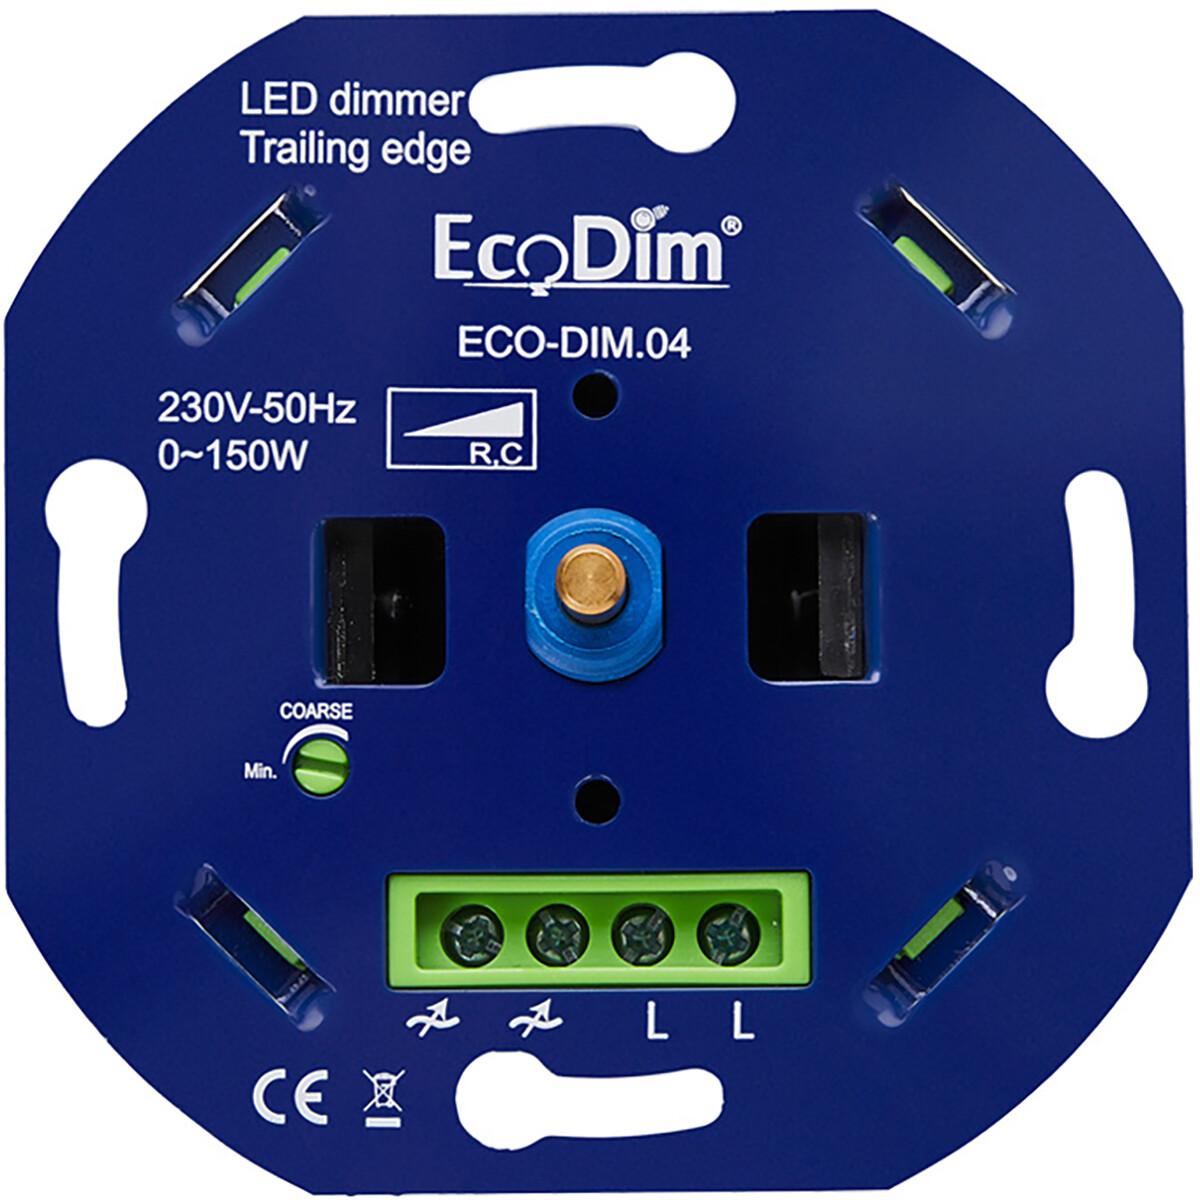 EcoDim - LED Dimmer - ECO-DIM.04 - Fase Afsnijding RC - Inbouw - Enkel Knop - 0-150W